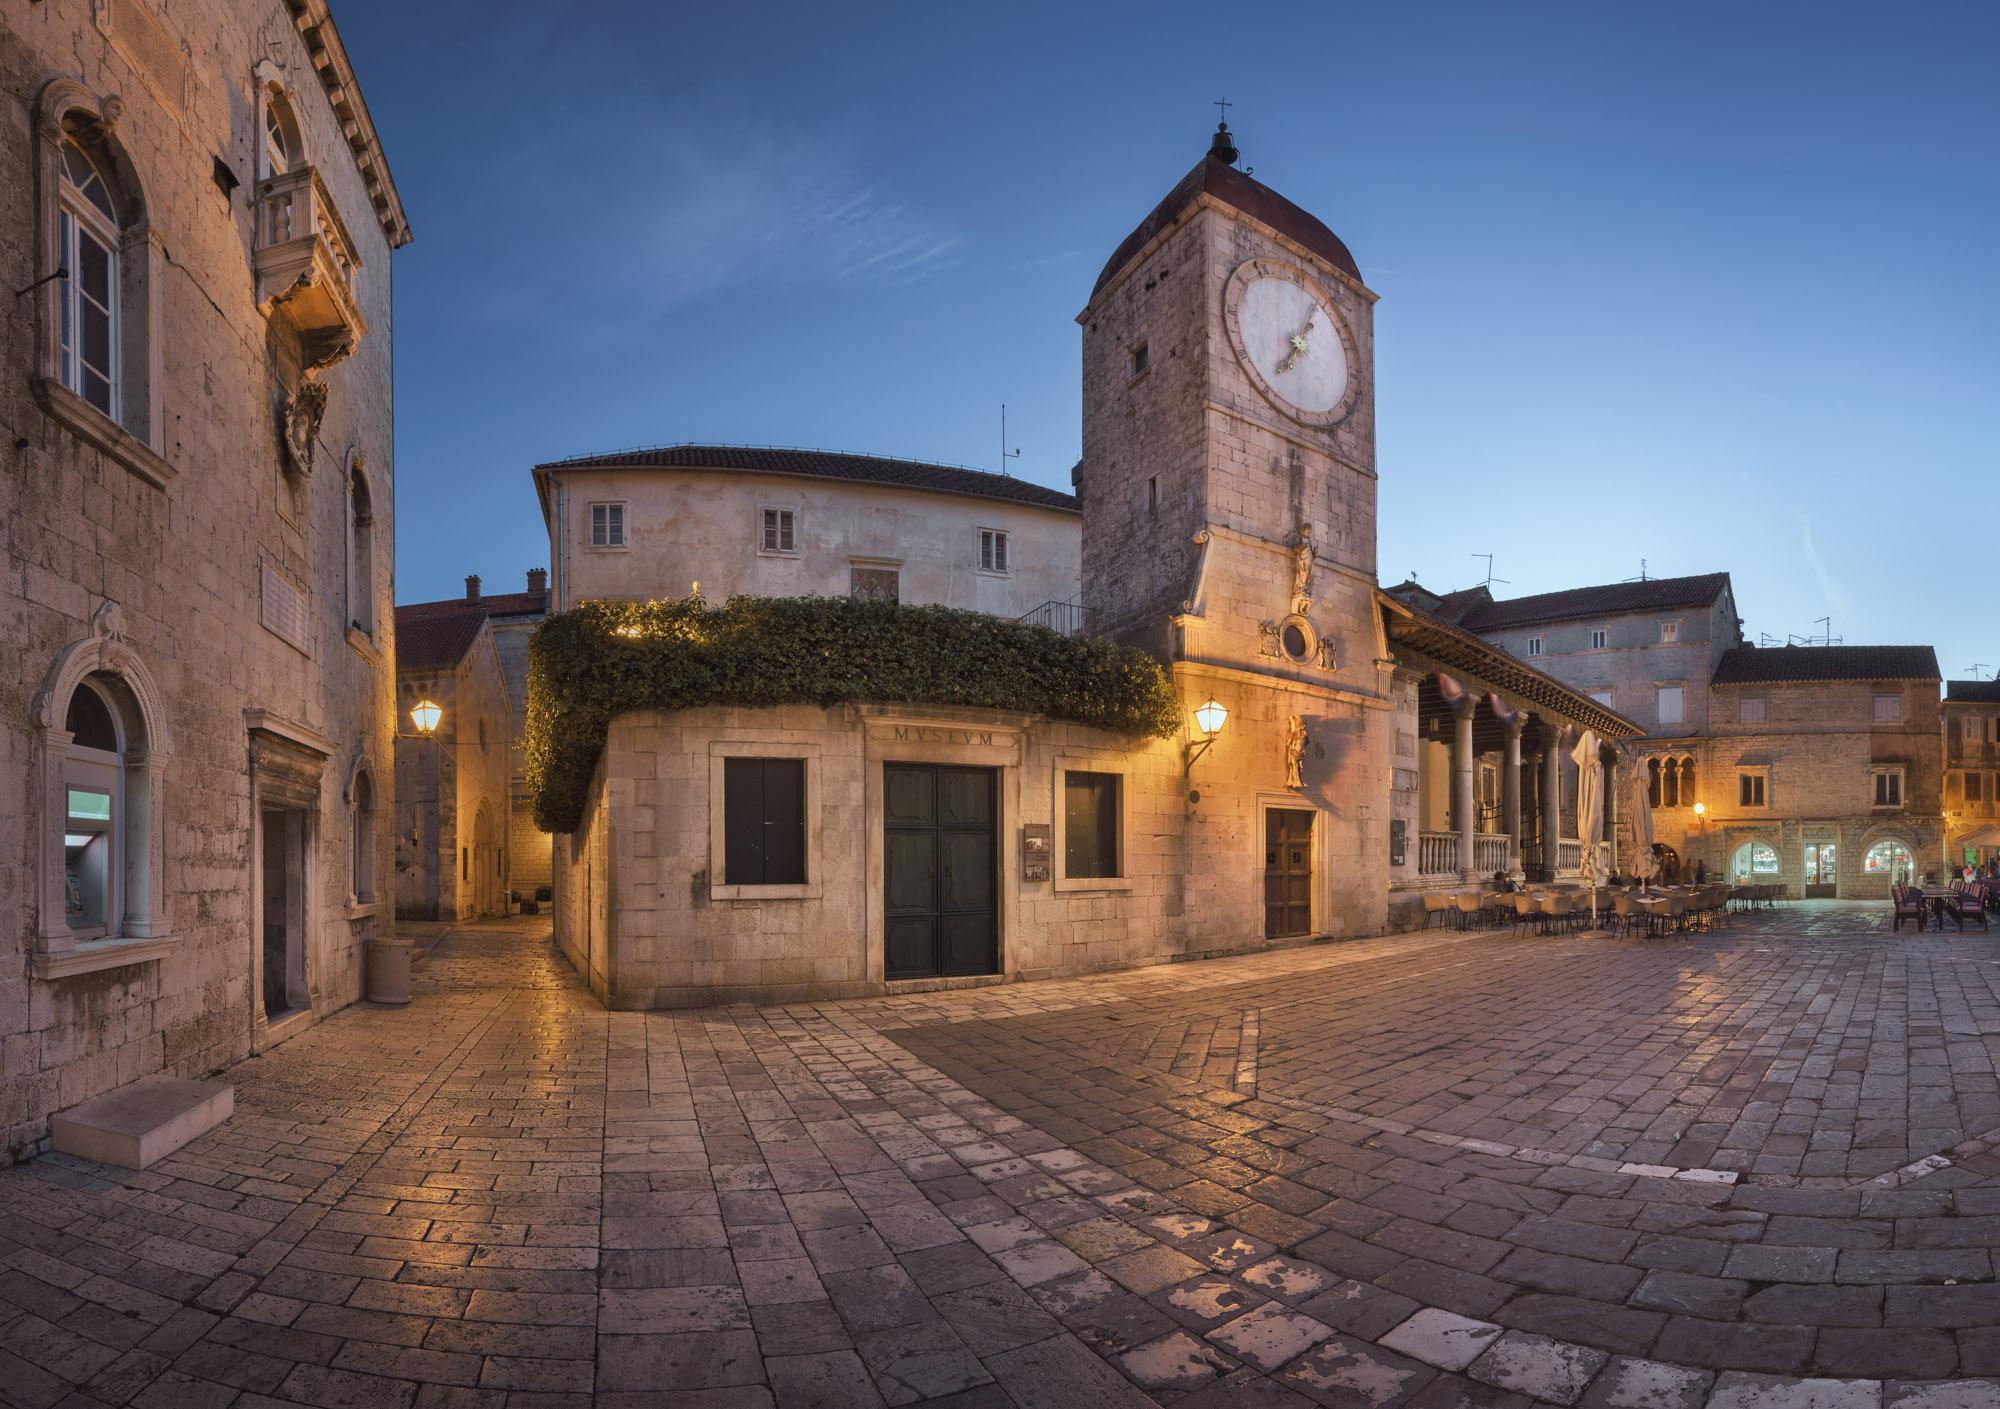 Trg Ivana Pavla II in the Evening, Trogir, Croatia